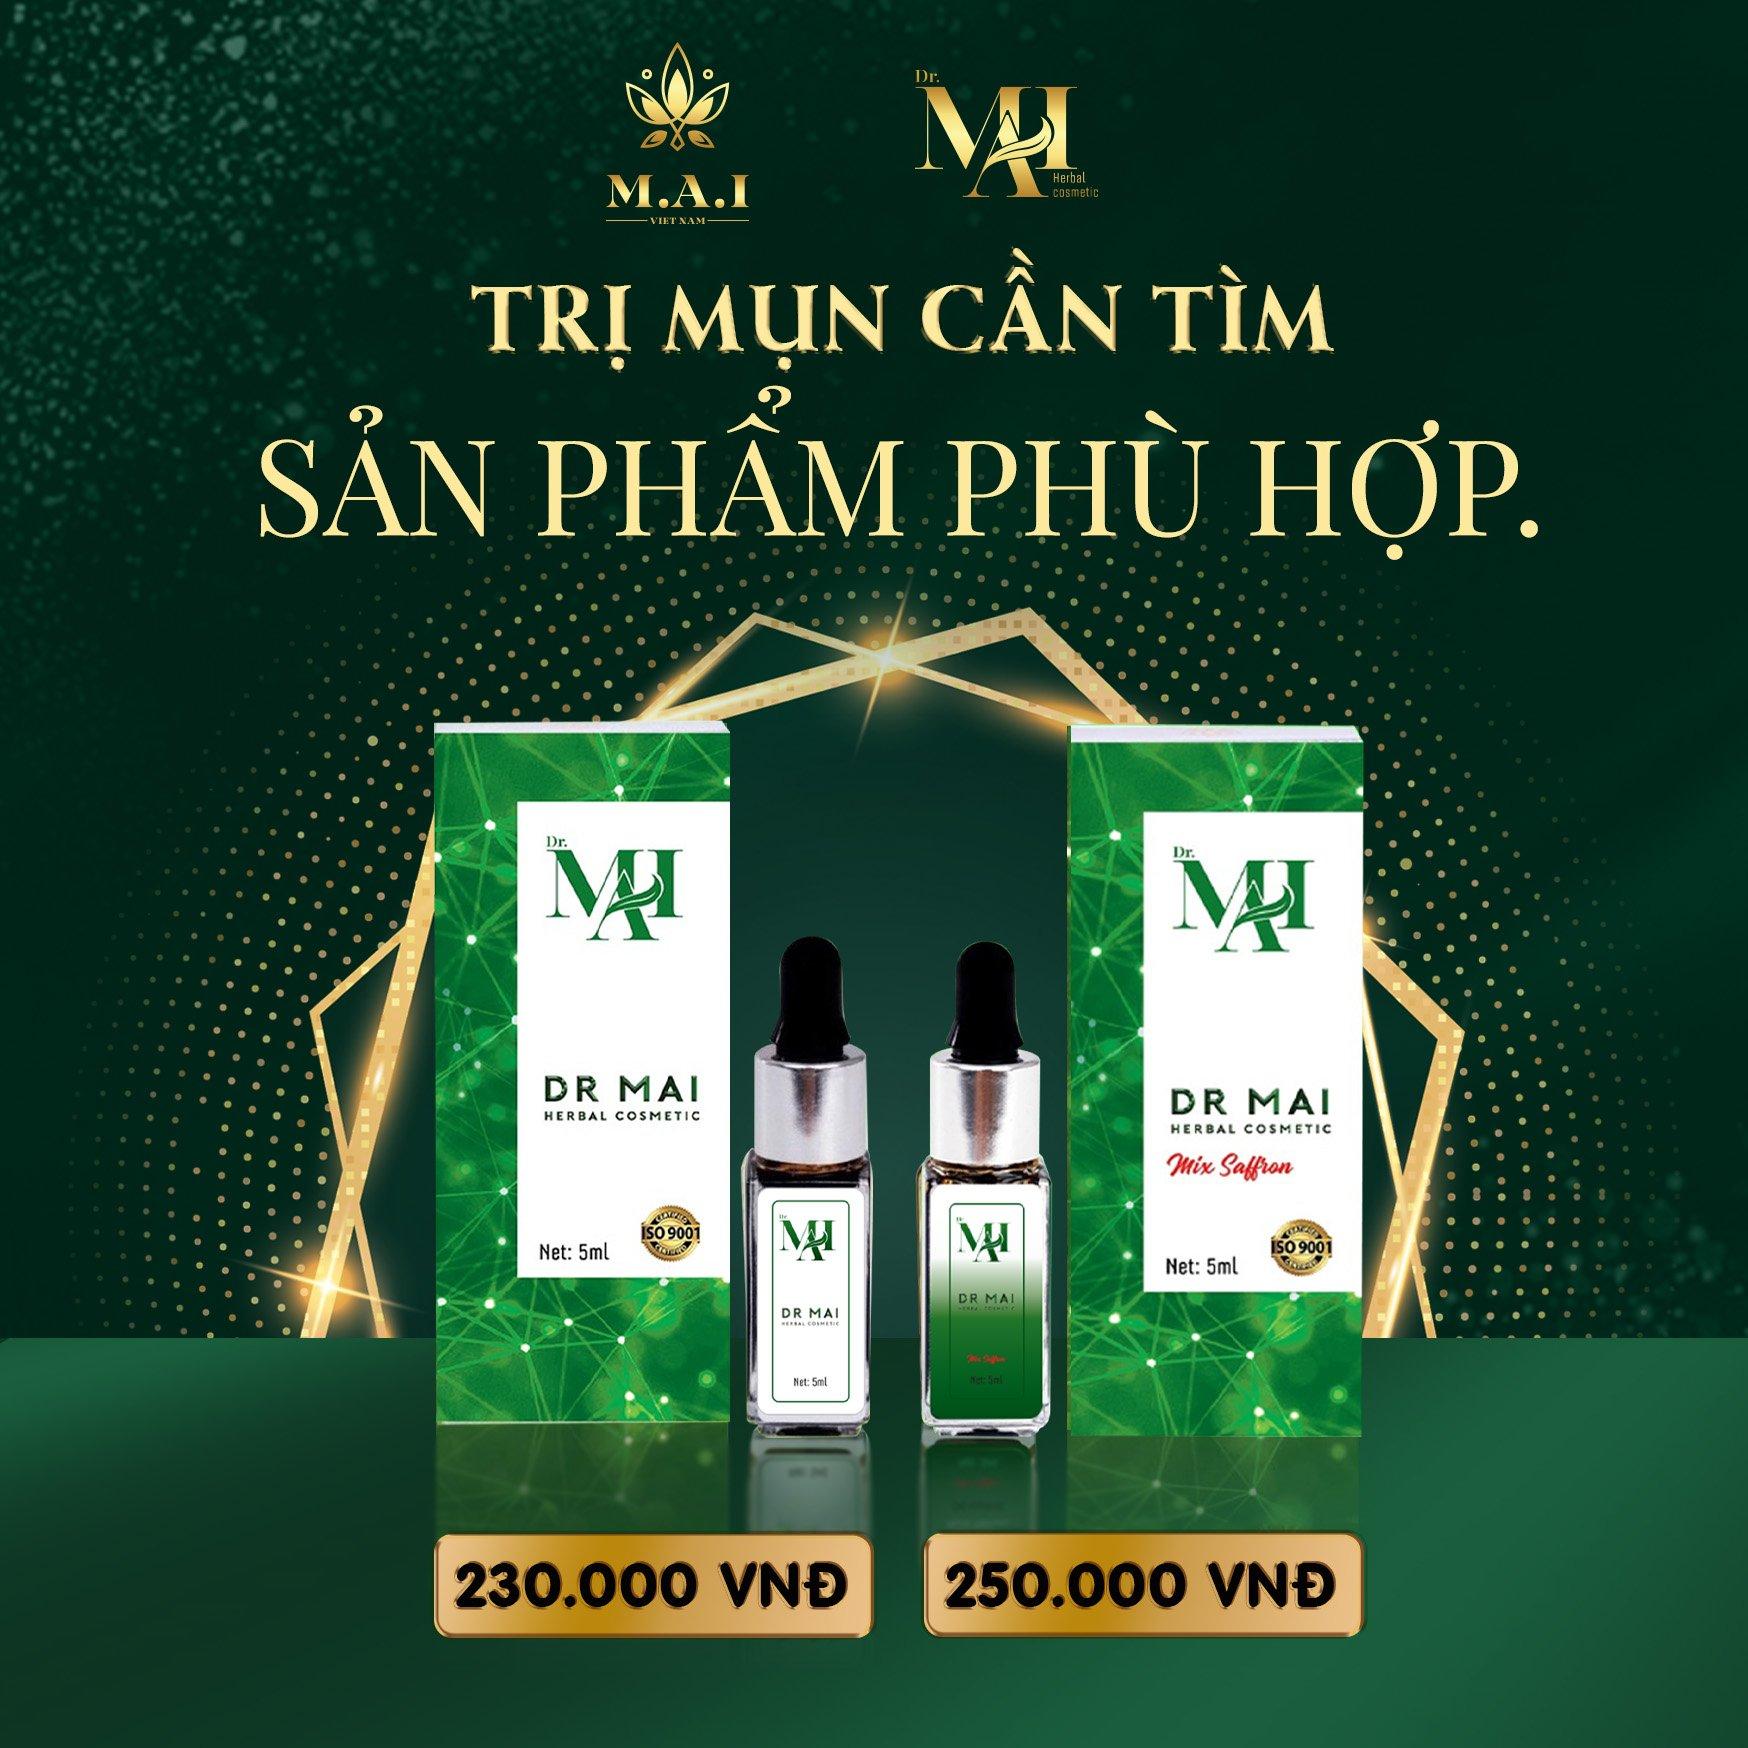 Dr Mai Mix Saffron - Mai Thảo Mộc Mix V2